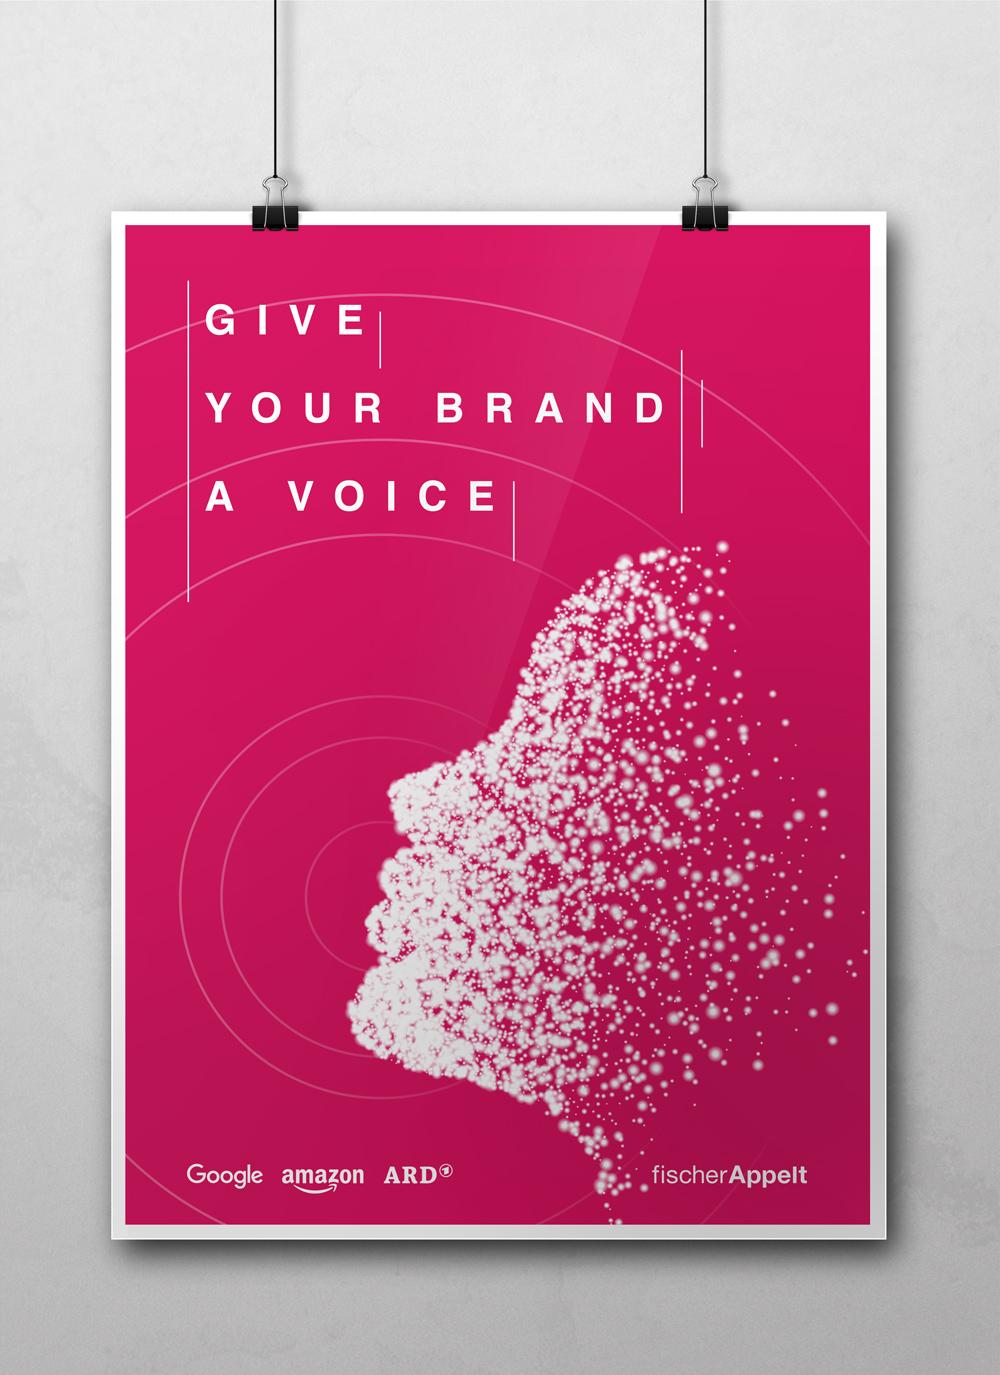 brand-voice-event-poster.jpg